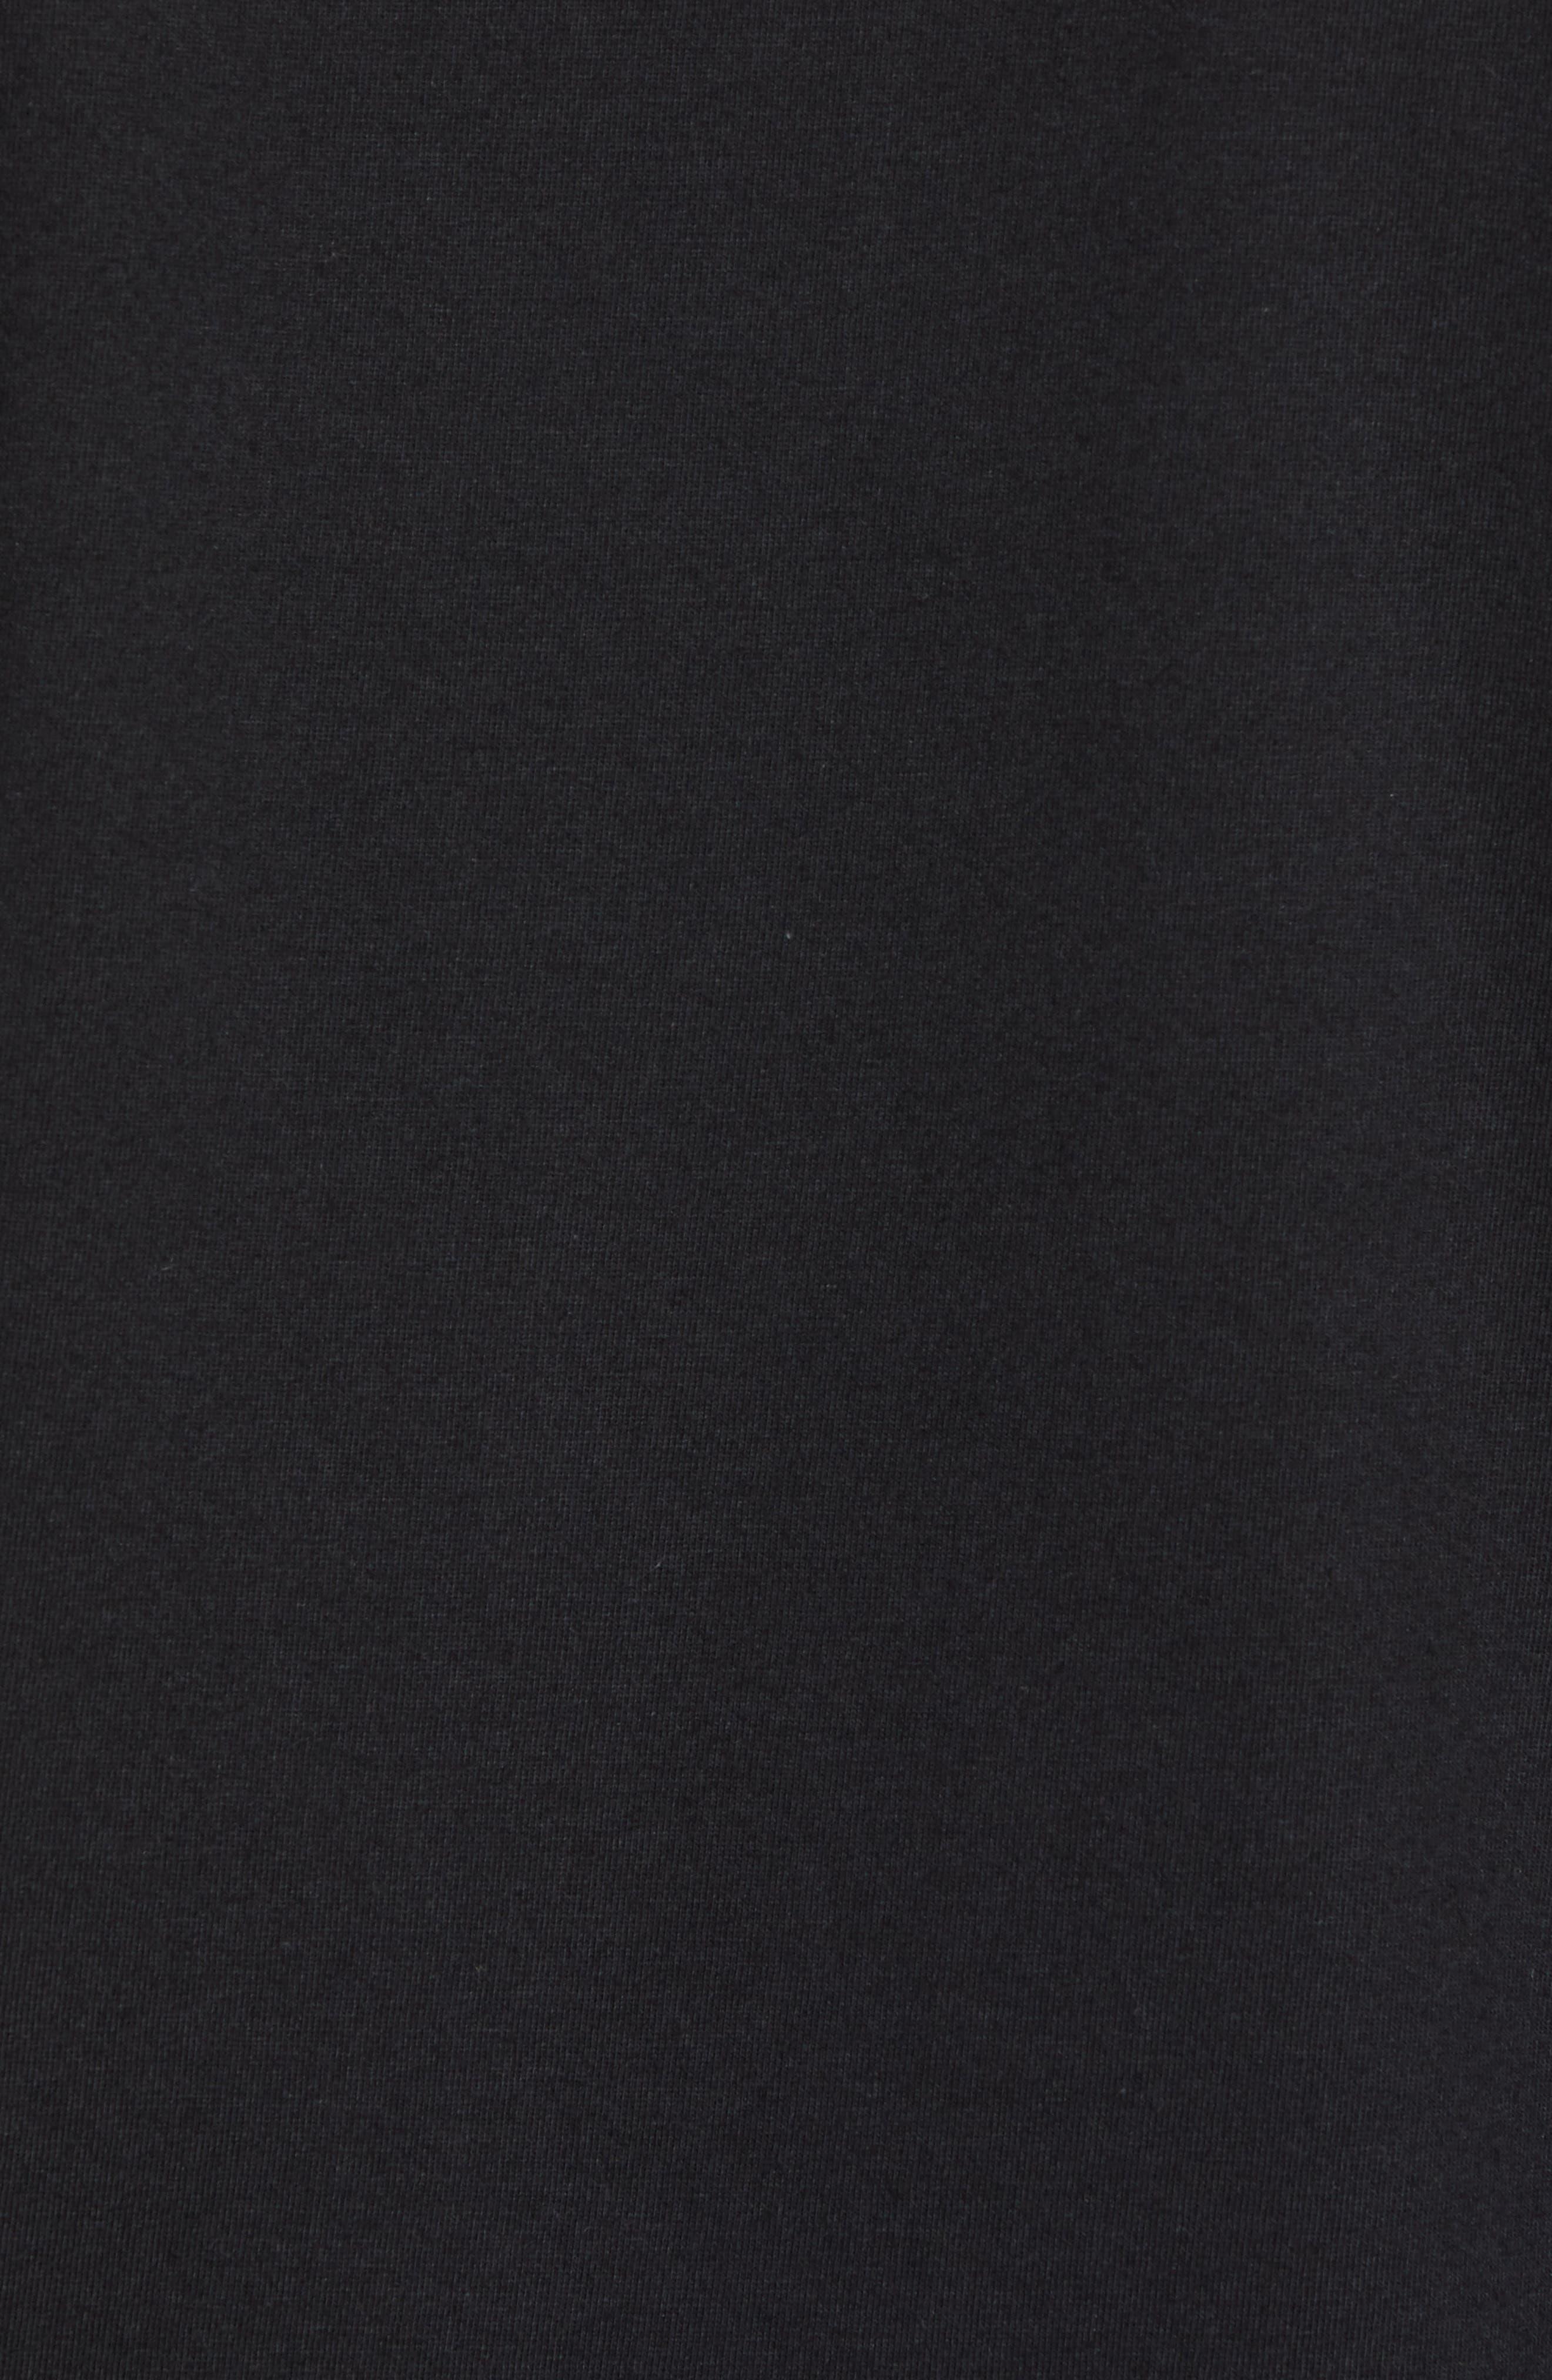 Dry Pointguard Graphic T-Shirt,                             Alternate thumbnail 5, color,                             BLACK/ BLACK